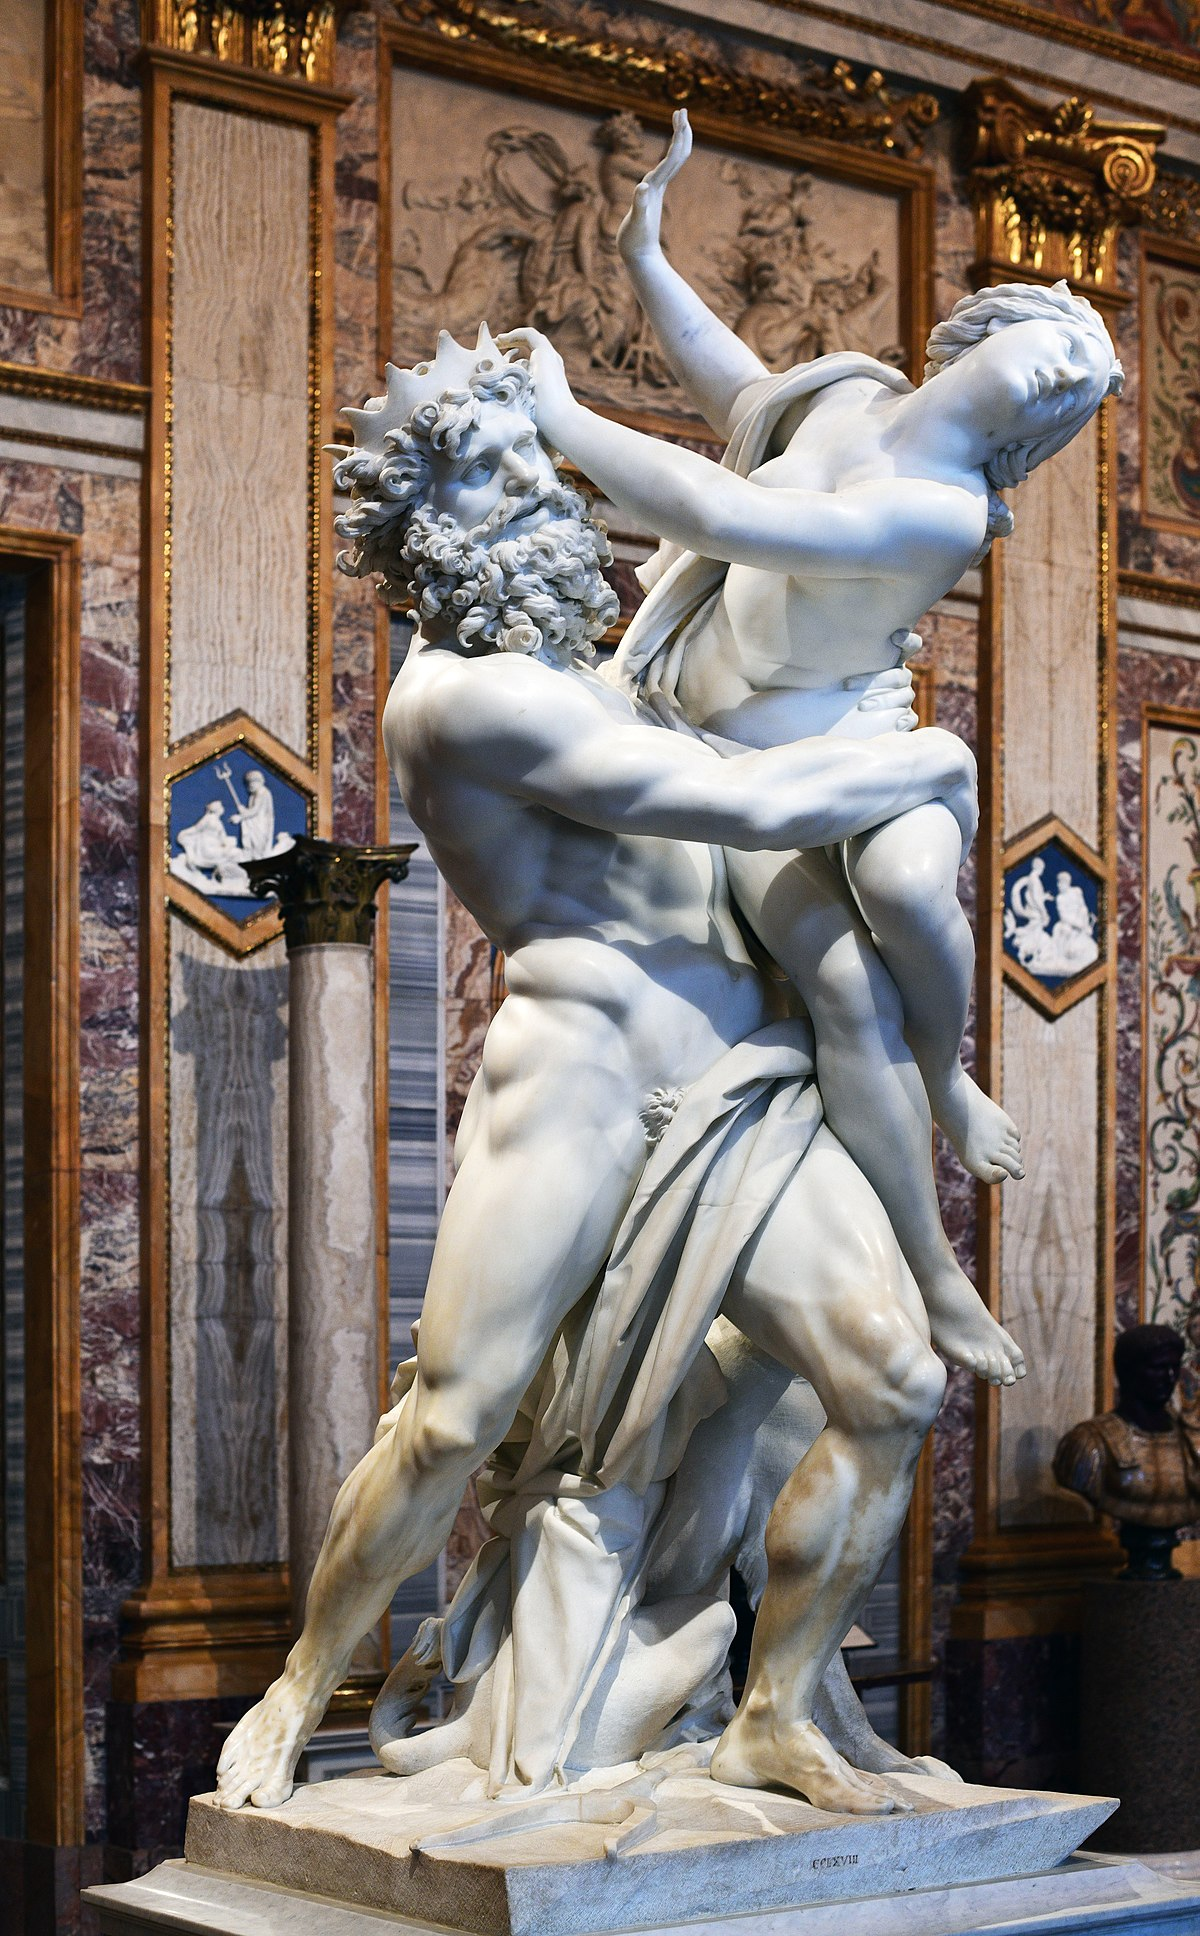 El rapto de Proserpina - Wikipedia, la enciclopedia libre